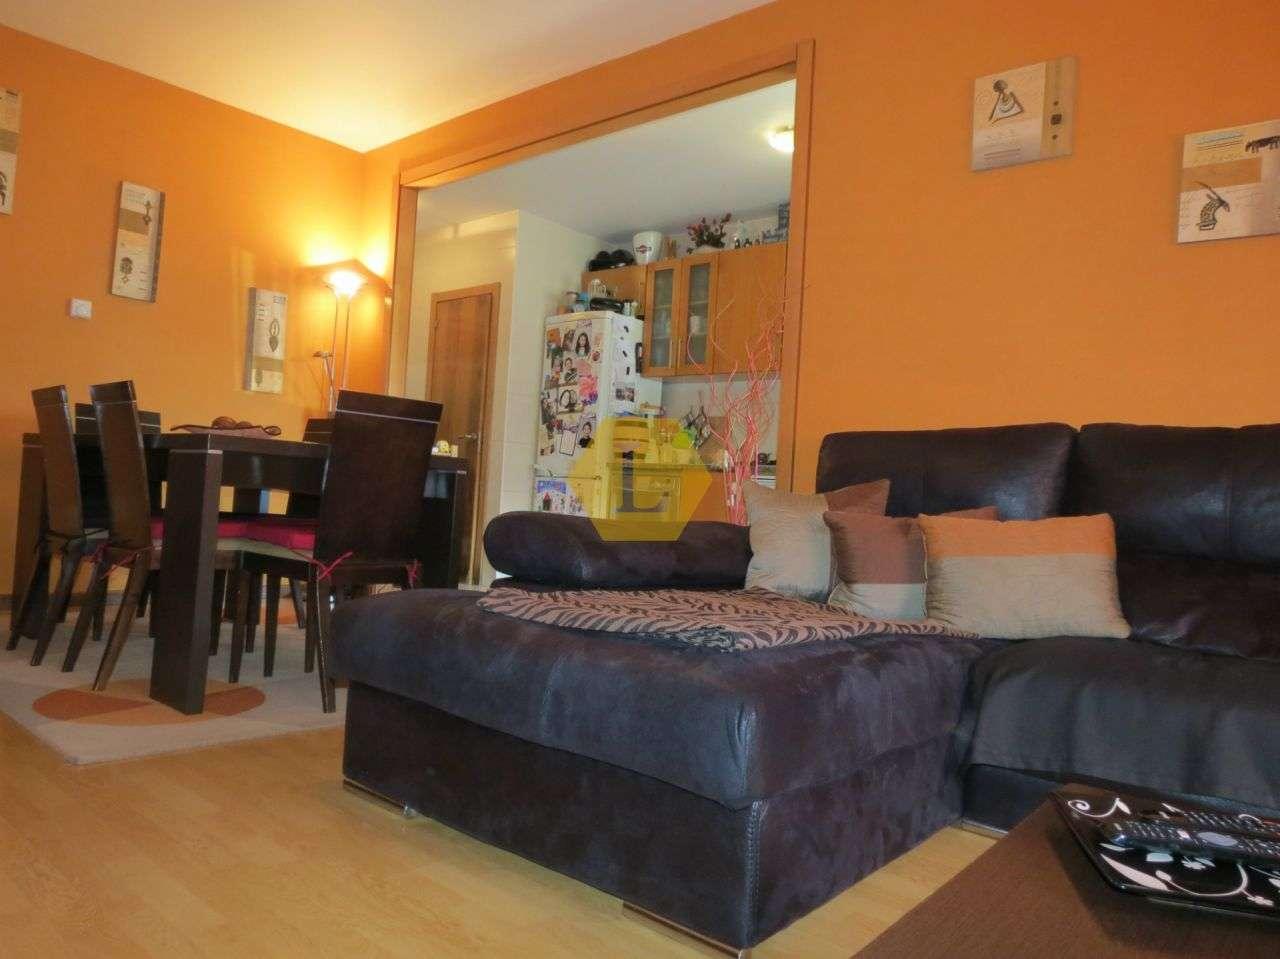 Apartamento para comprar, Gafanha da Nazaré, Aveiro - Foto 5